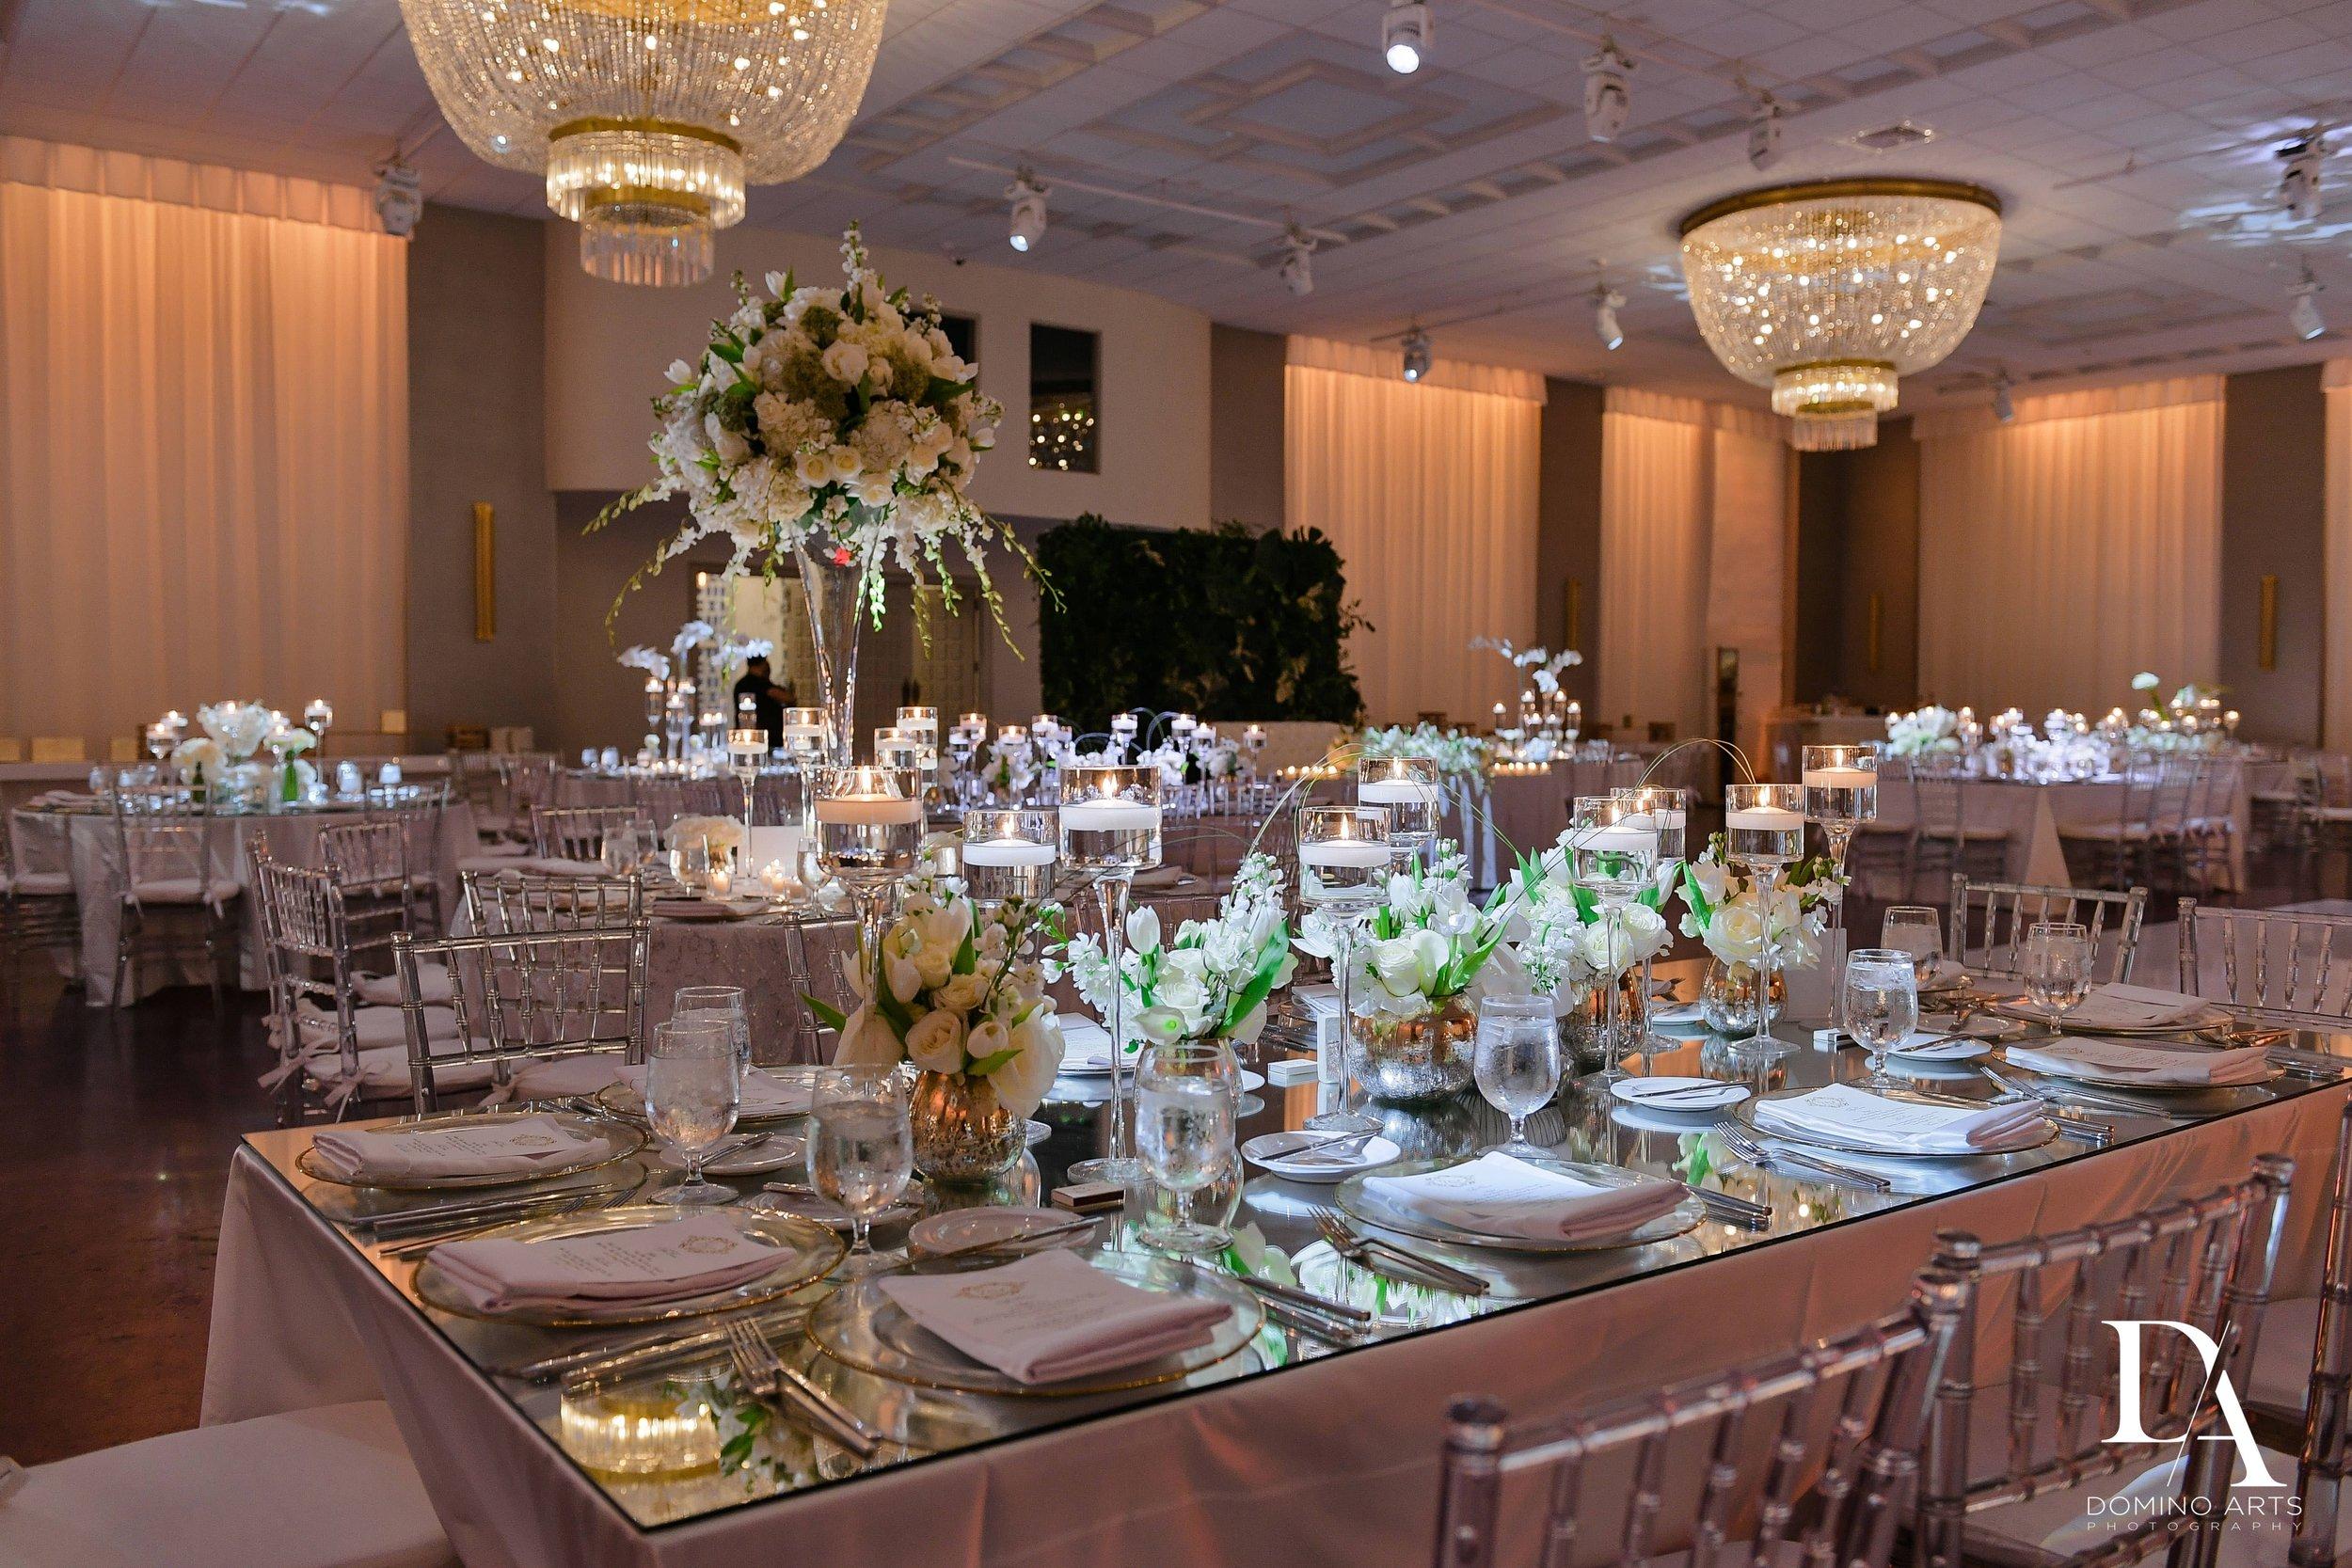 Beautiful Wedding Decor Miami Beach Venue.jpg